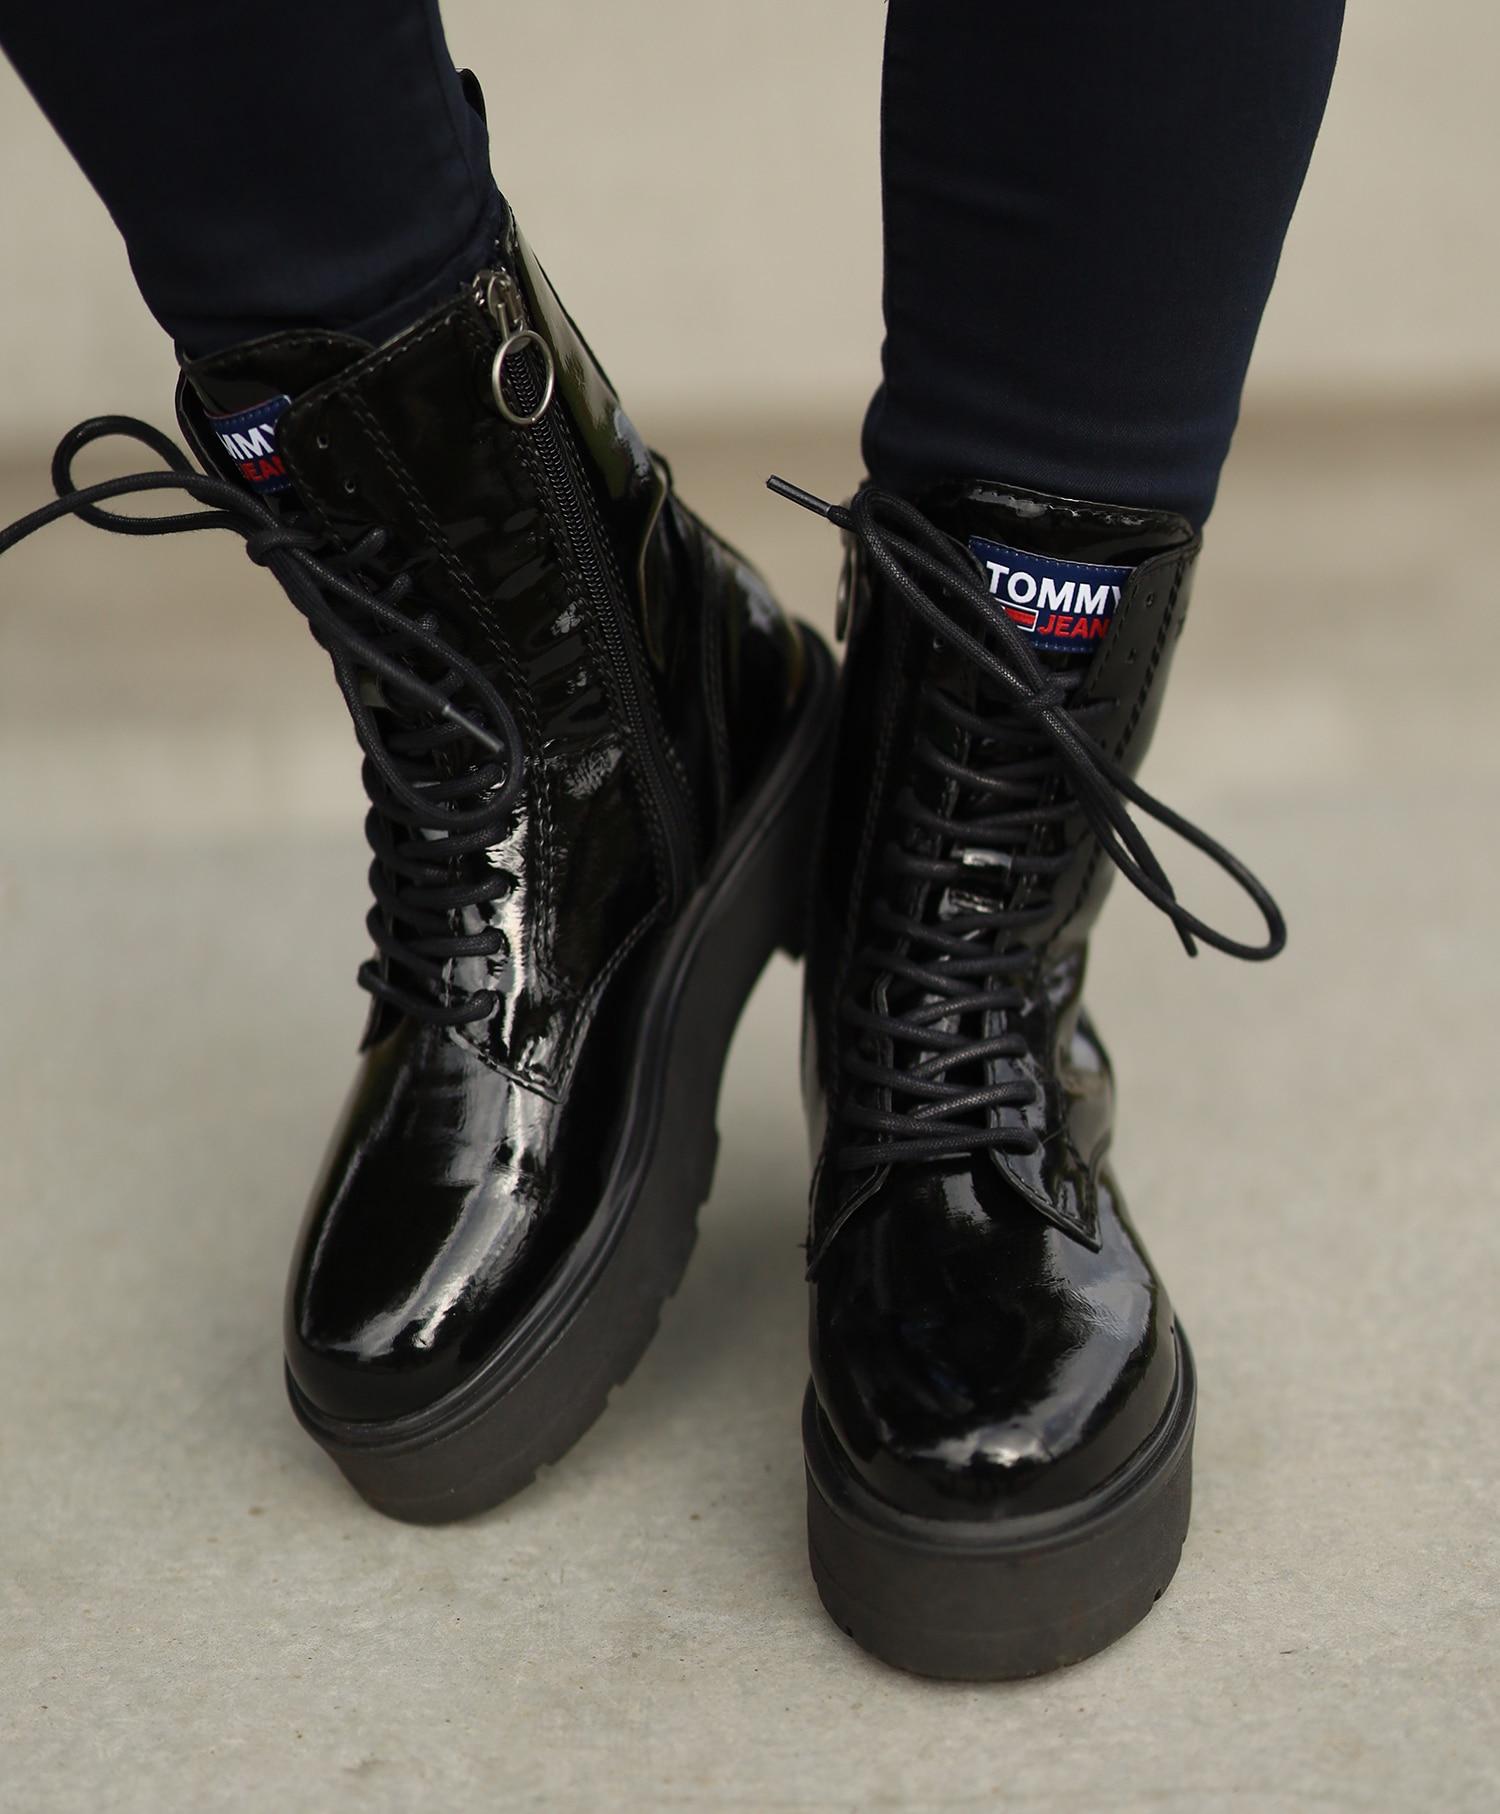 Tommy Hilfiger Flat boot